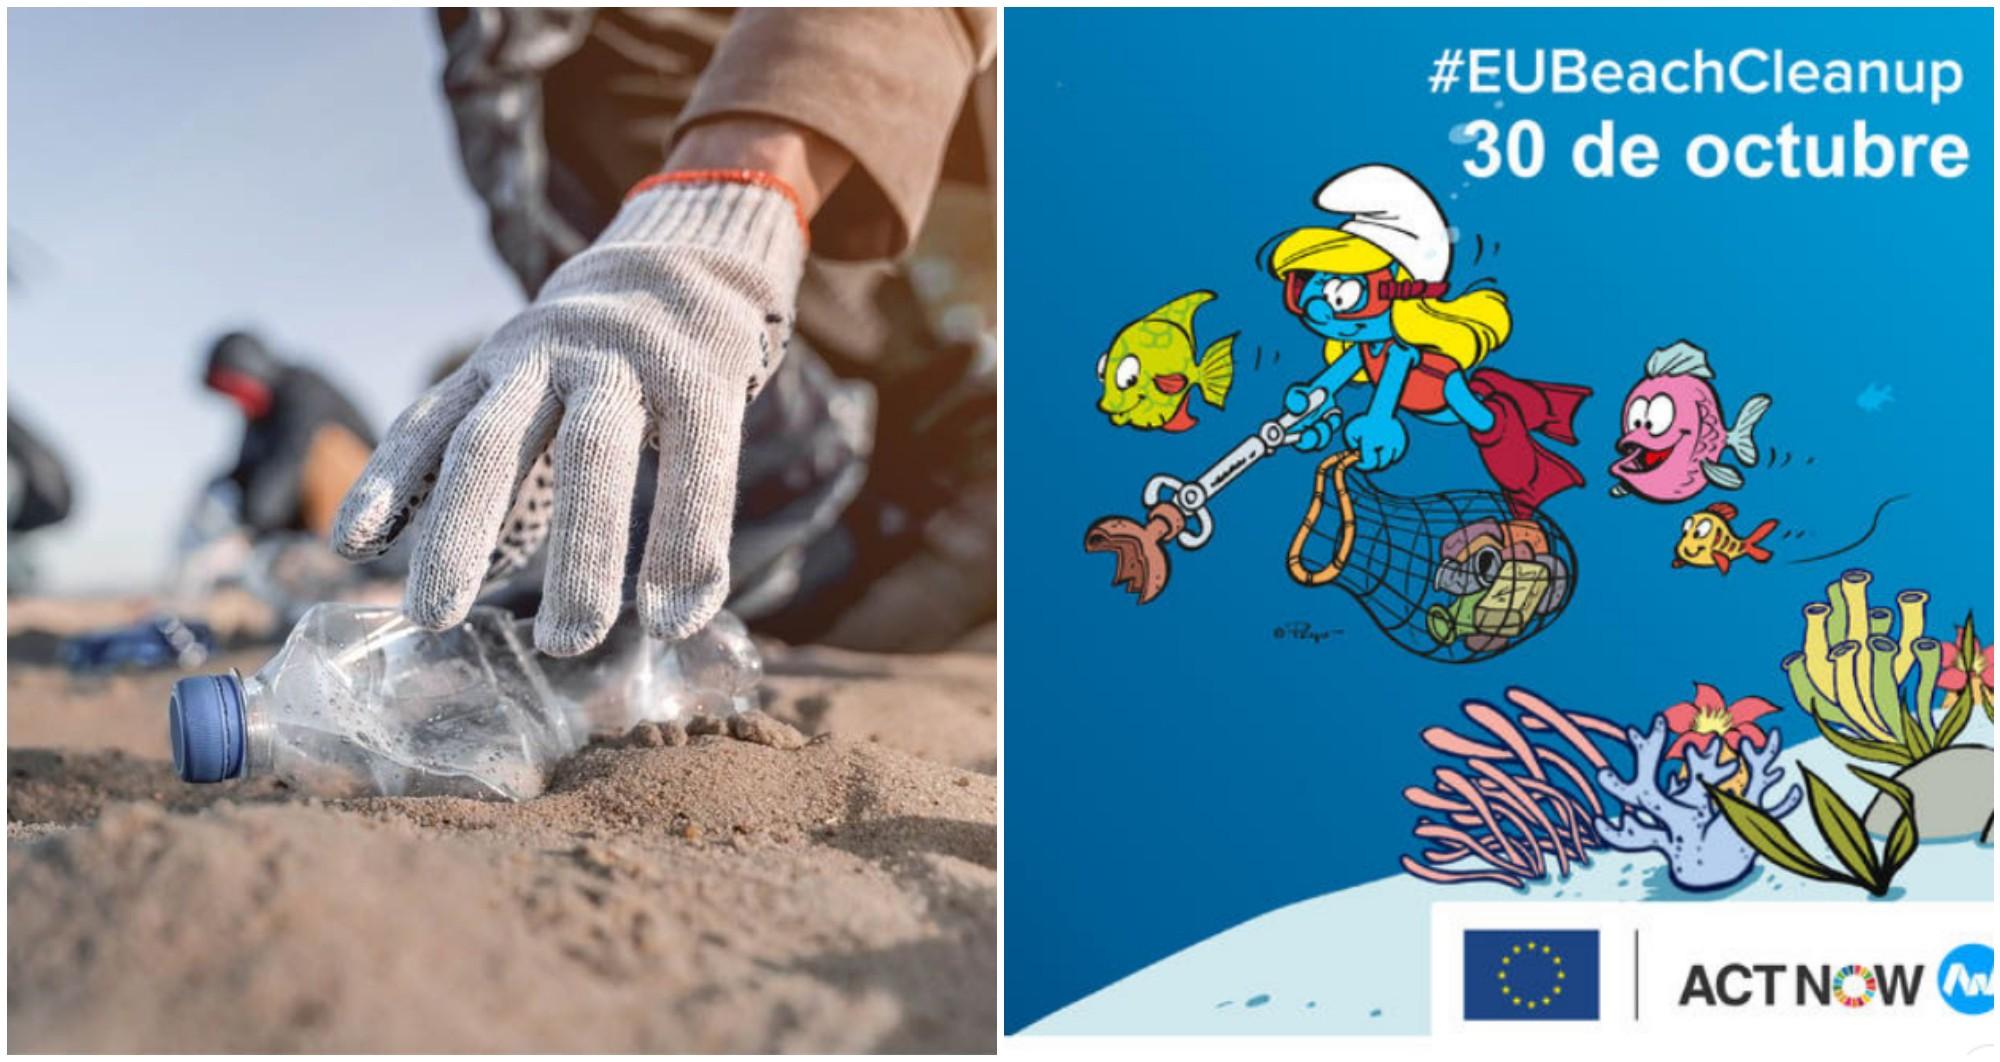 Unión Europea crea campaña de limpieza de playas de Honduras